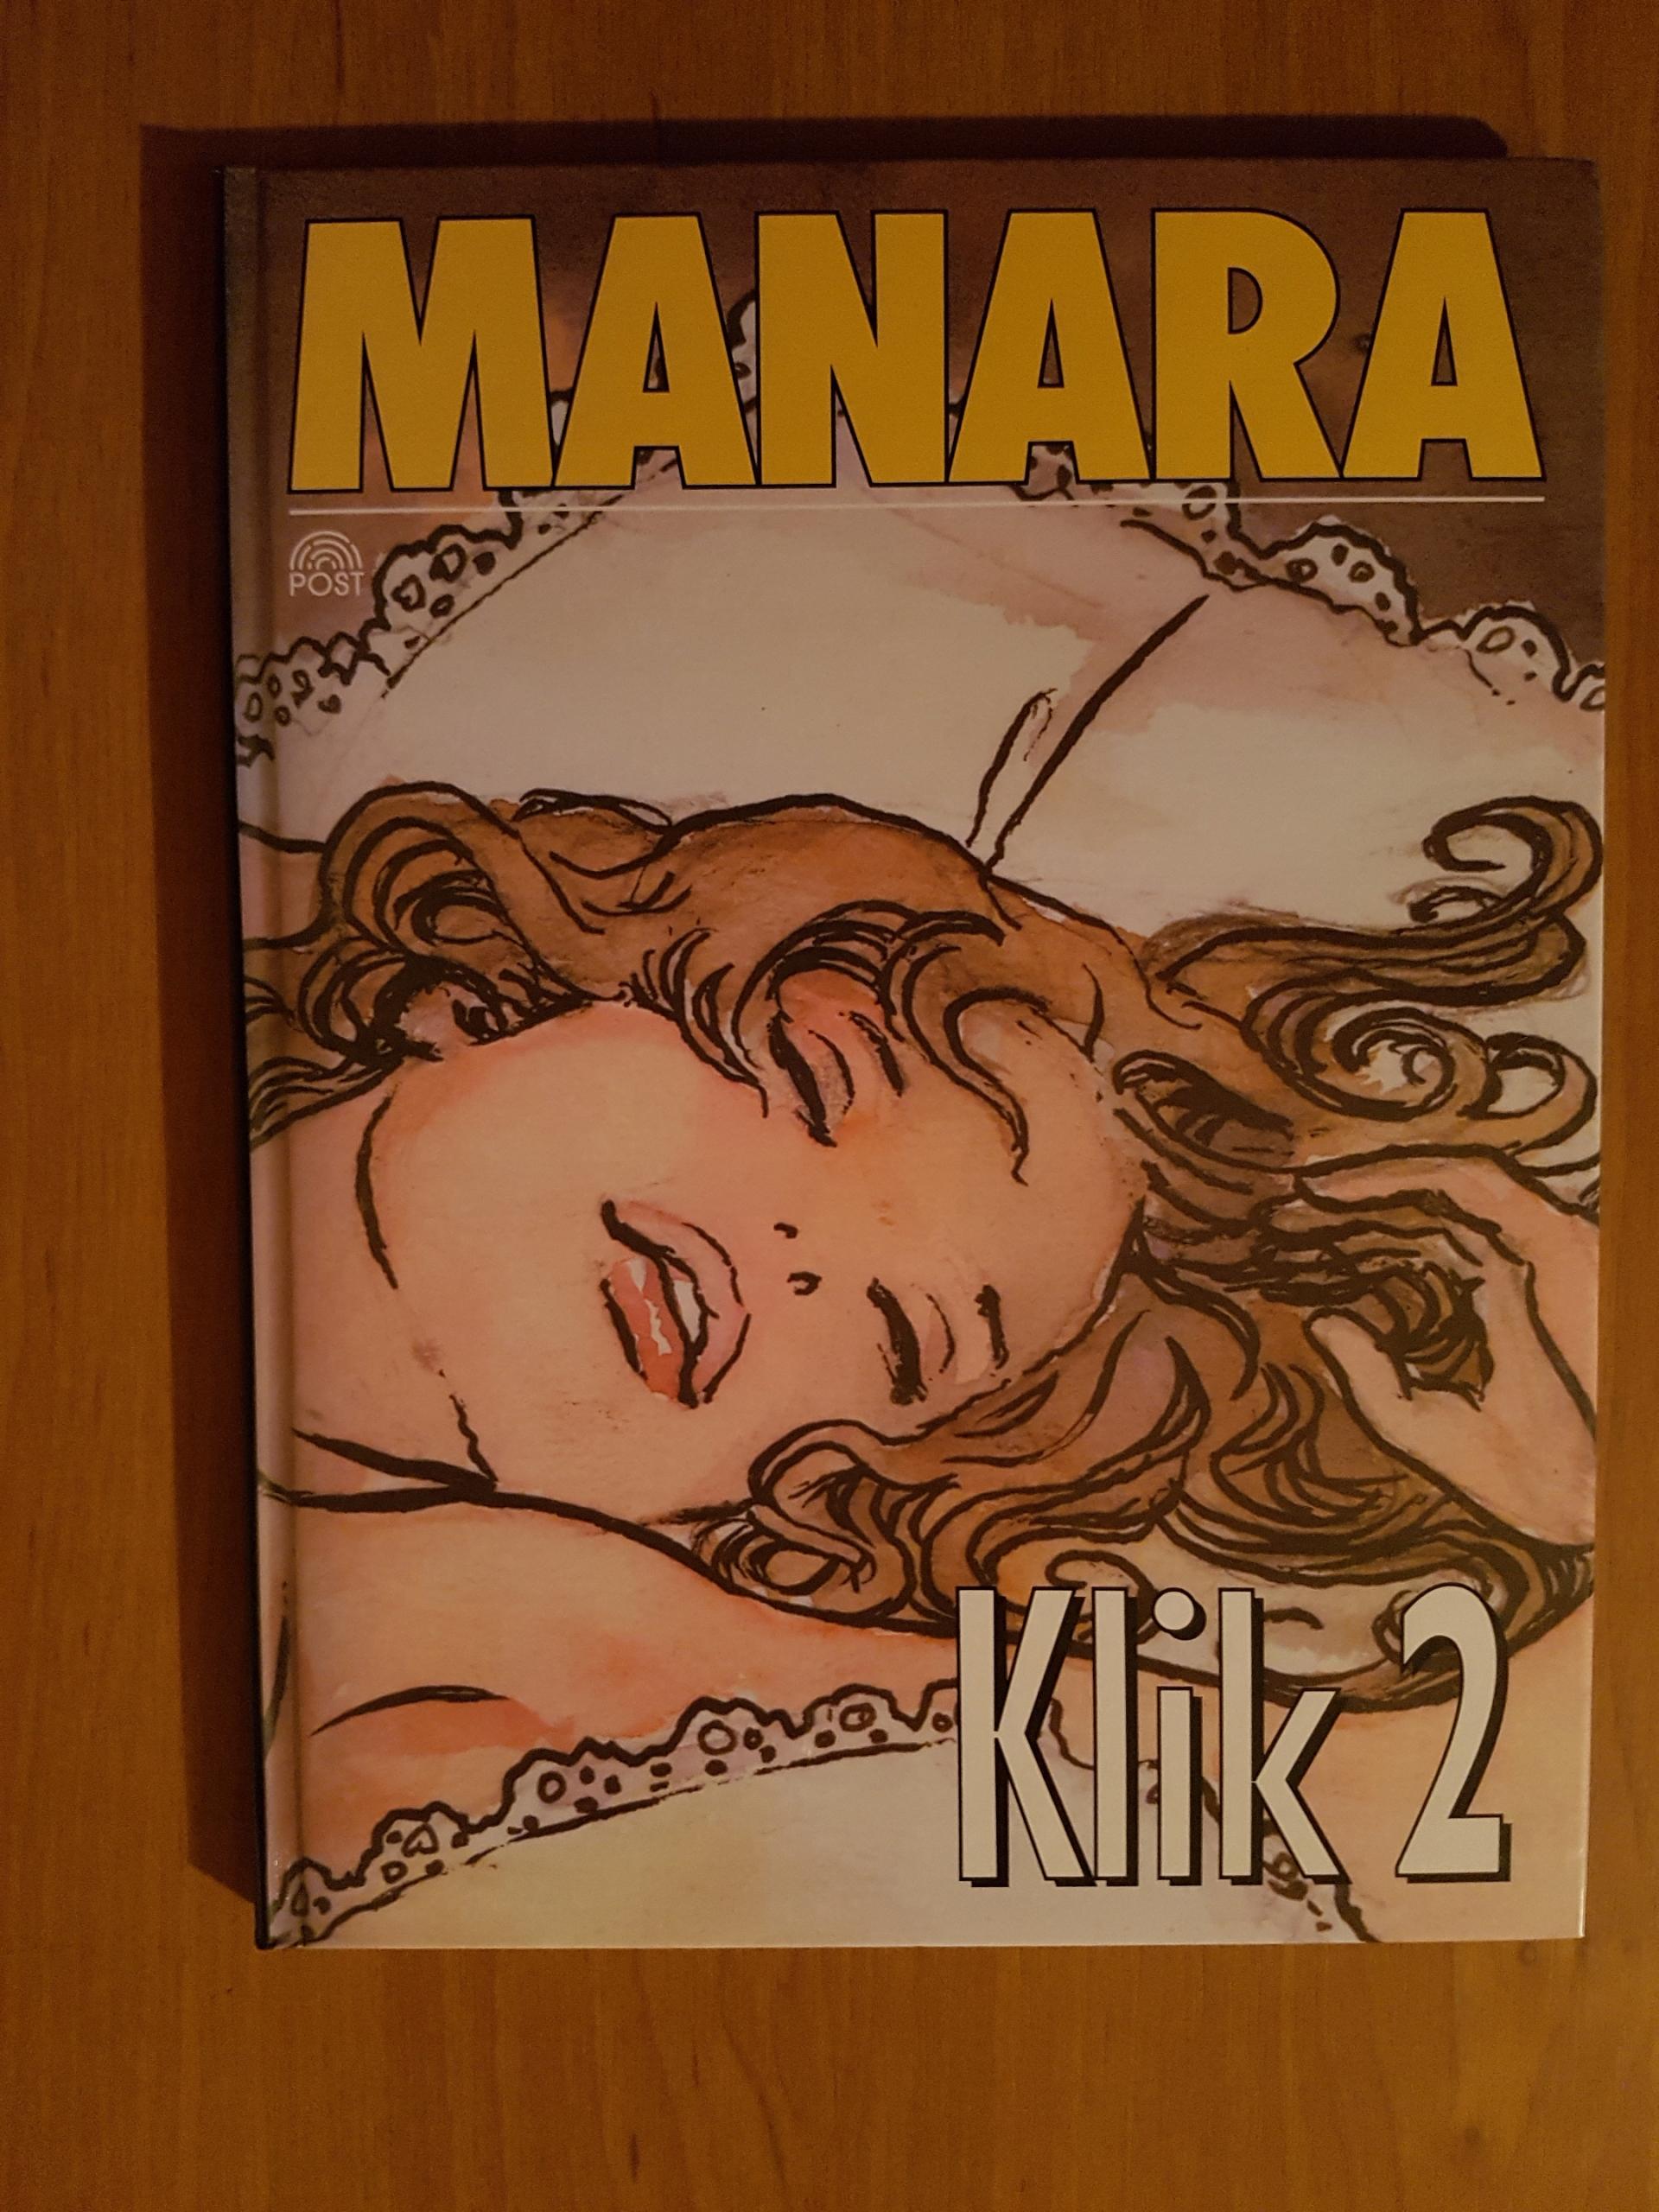 Komiks Milo Manara KLIK 2 Kobieta pod Presją 2005r